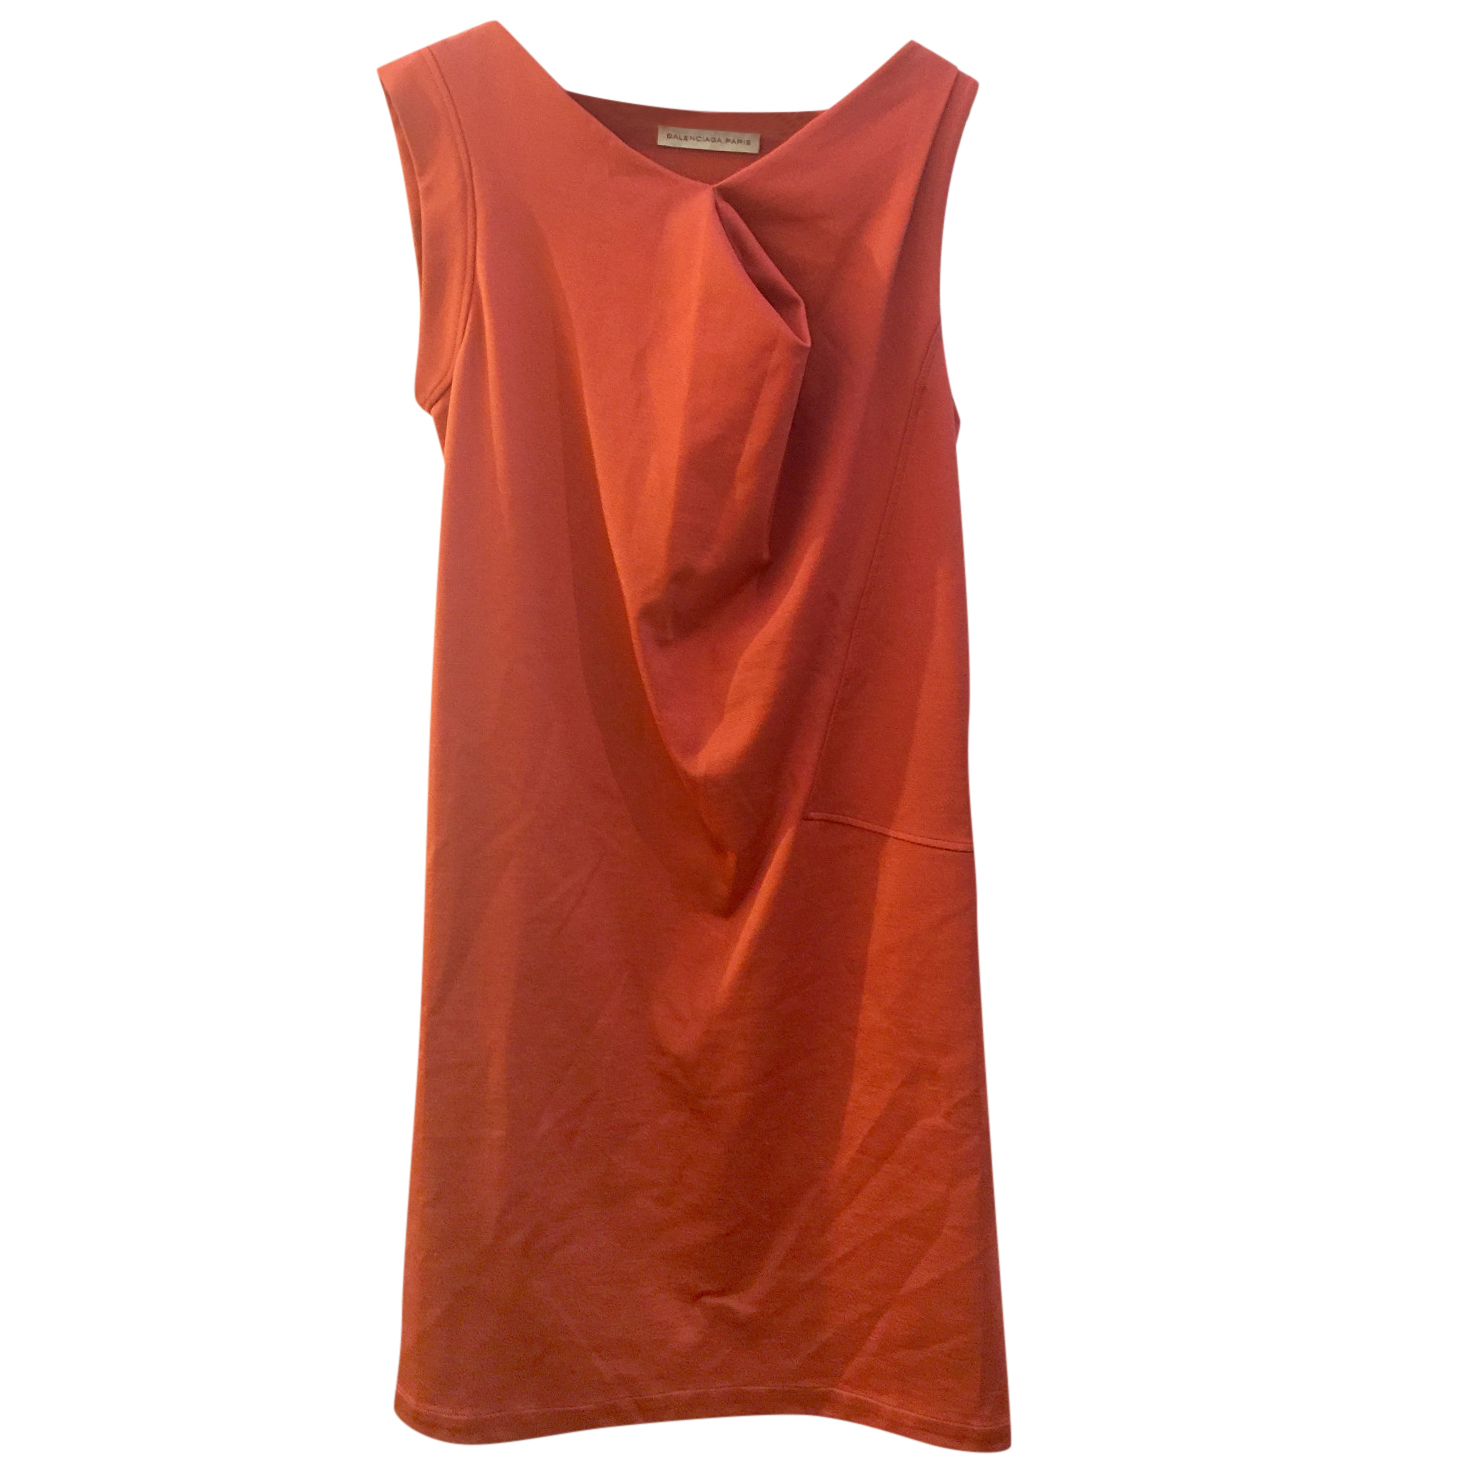 Balenciaga Stretch Crepe Asymmetric Dress